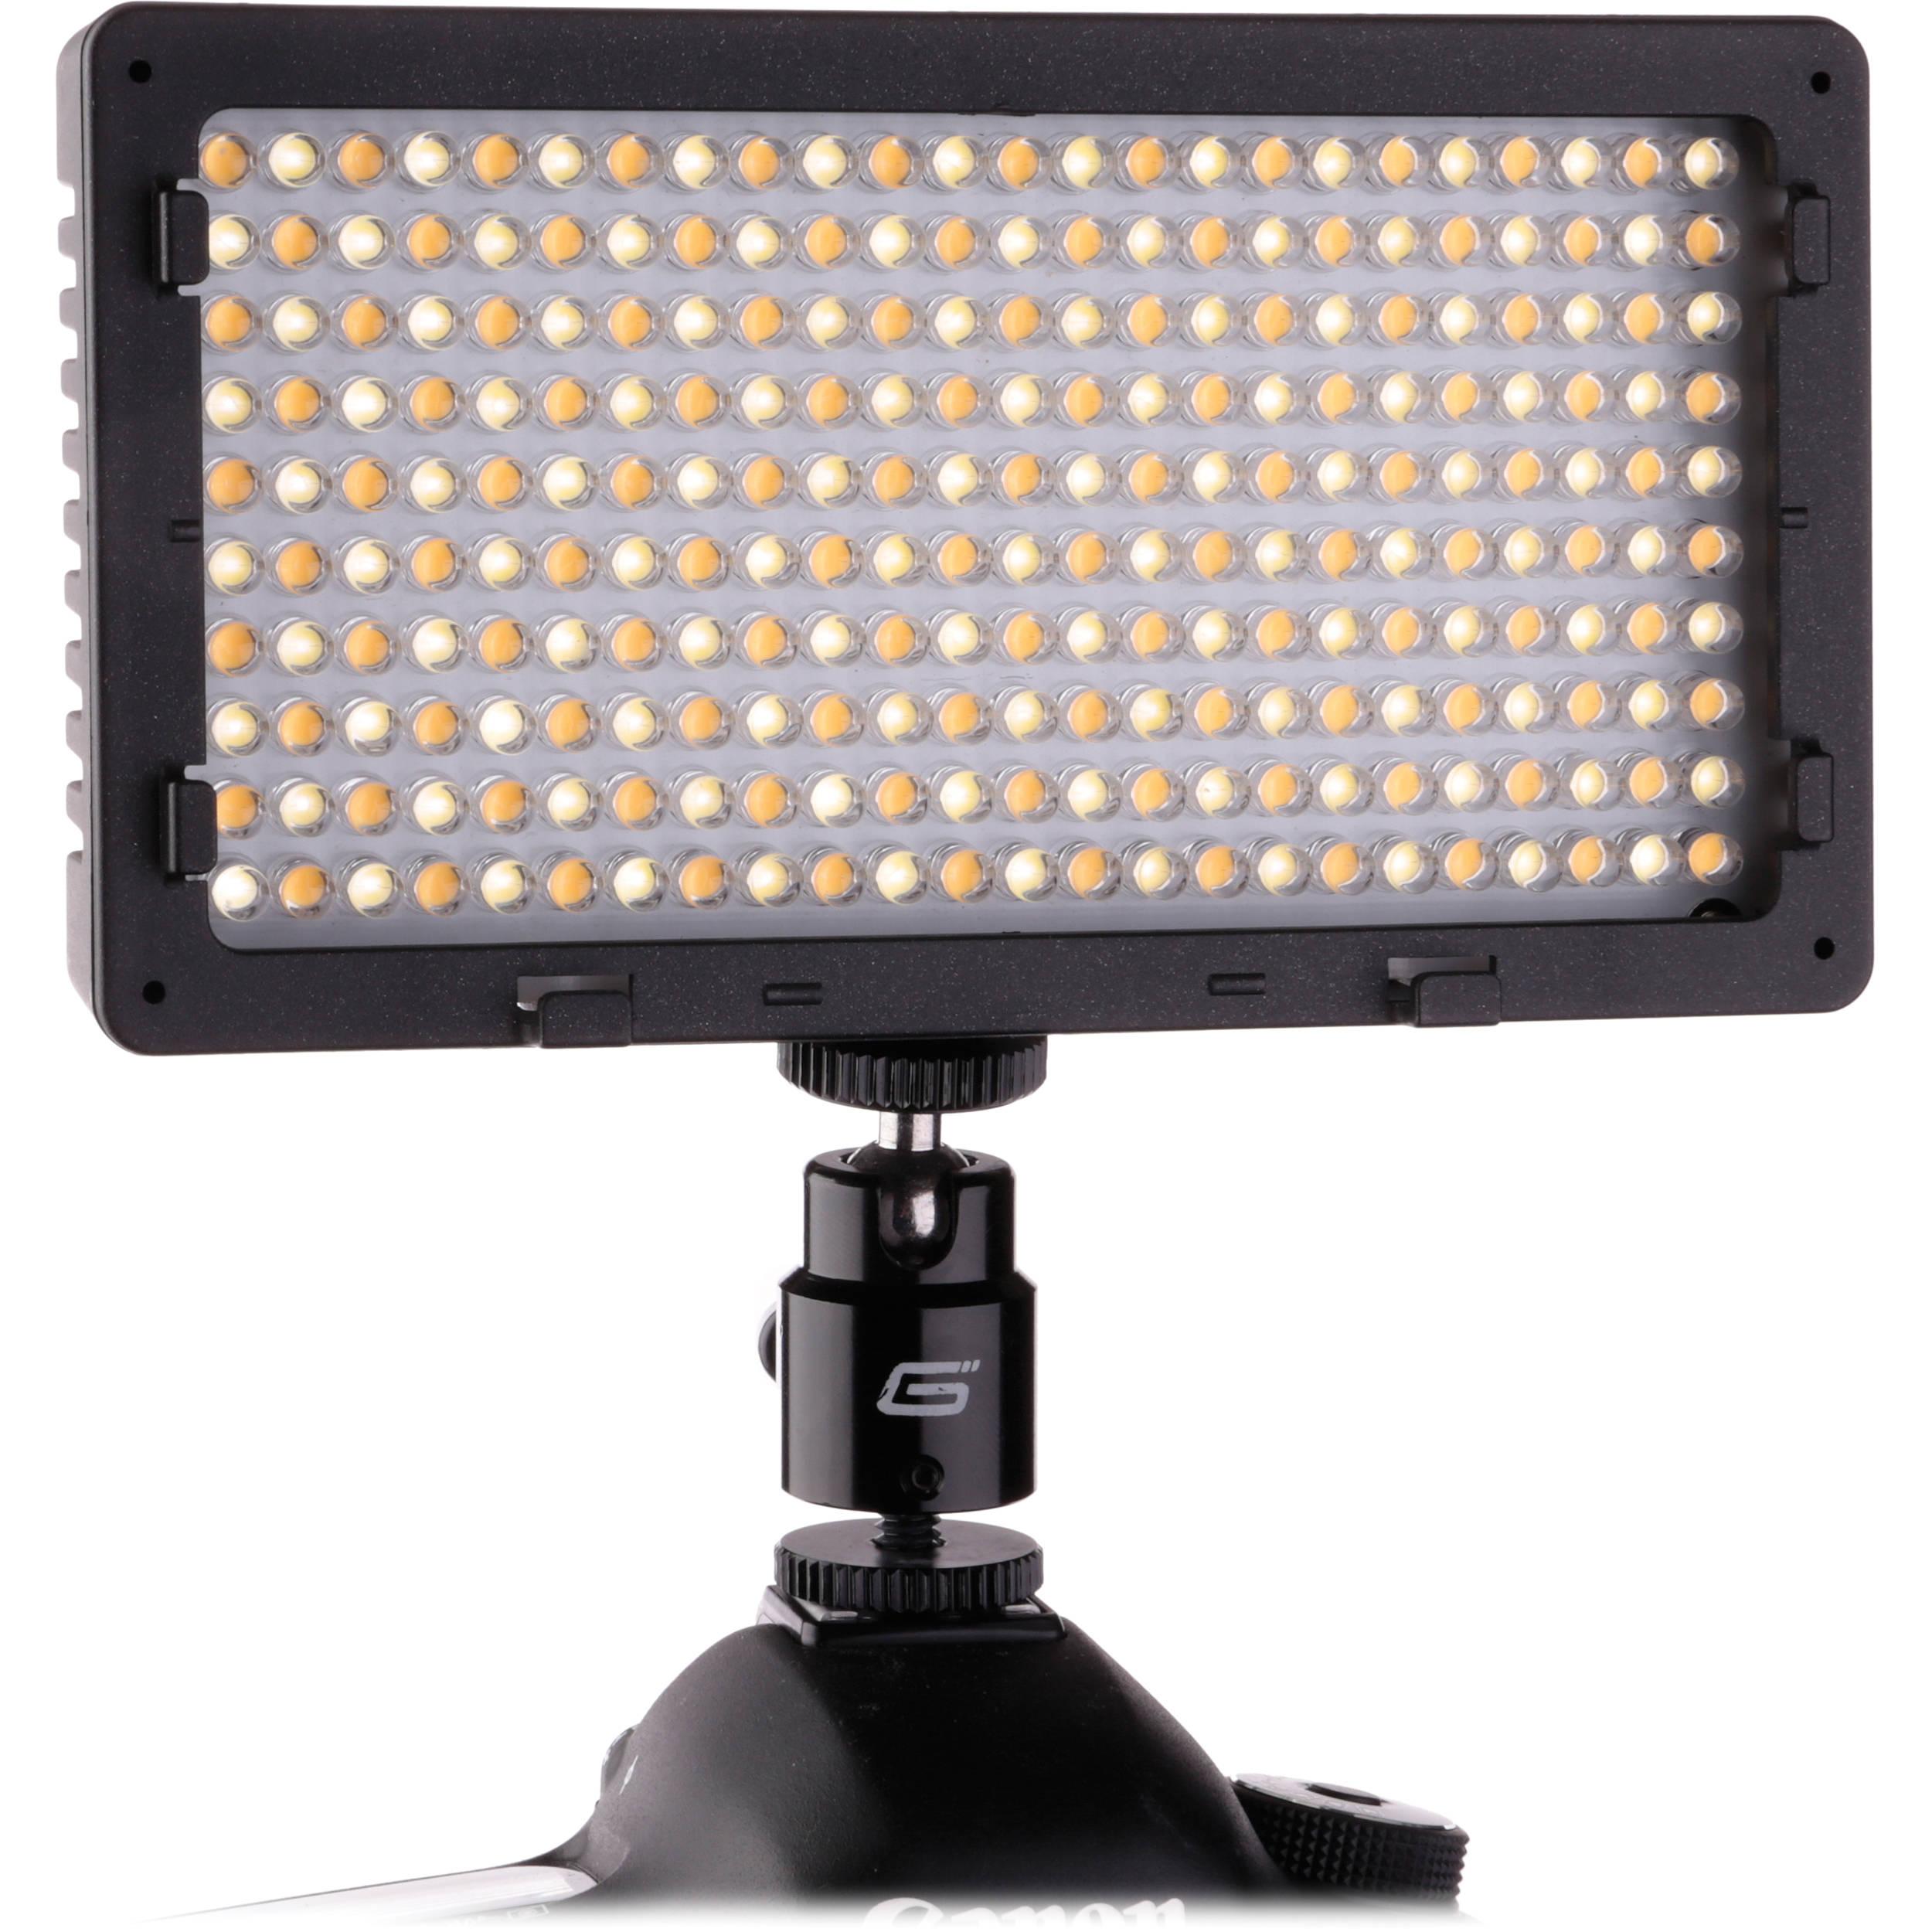 Genaray LED-5700T 240 LED Variable-Color On-Camera LED